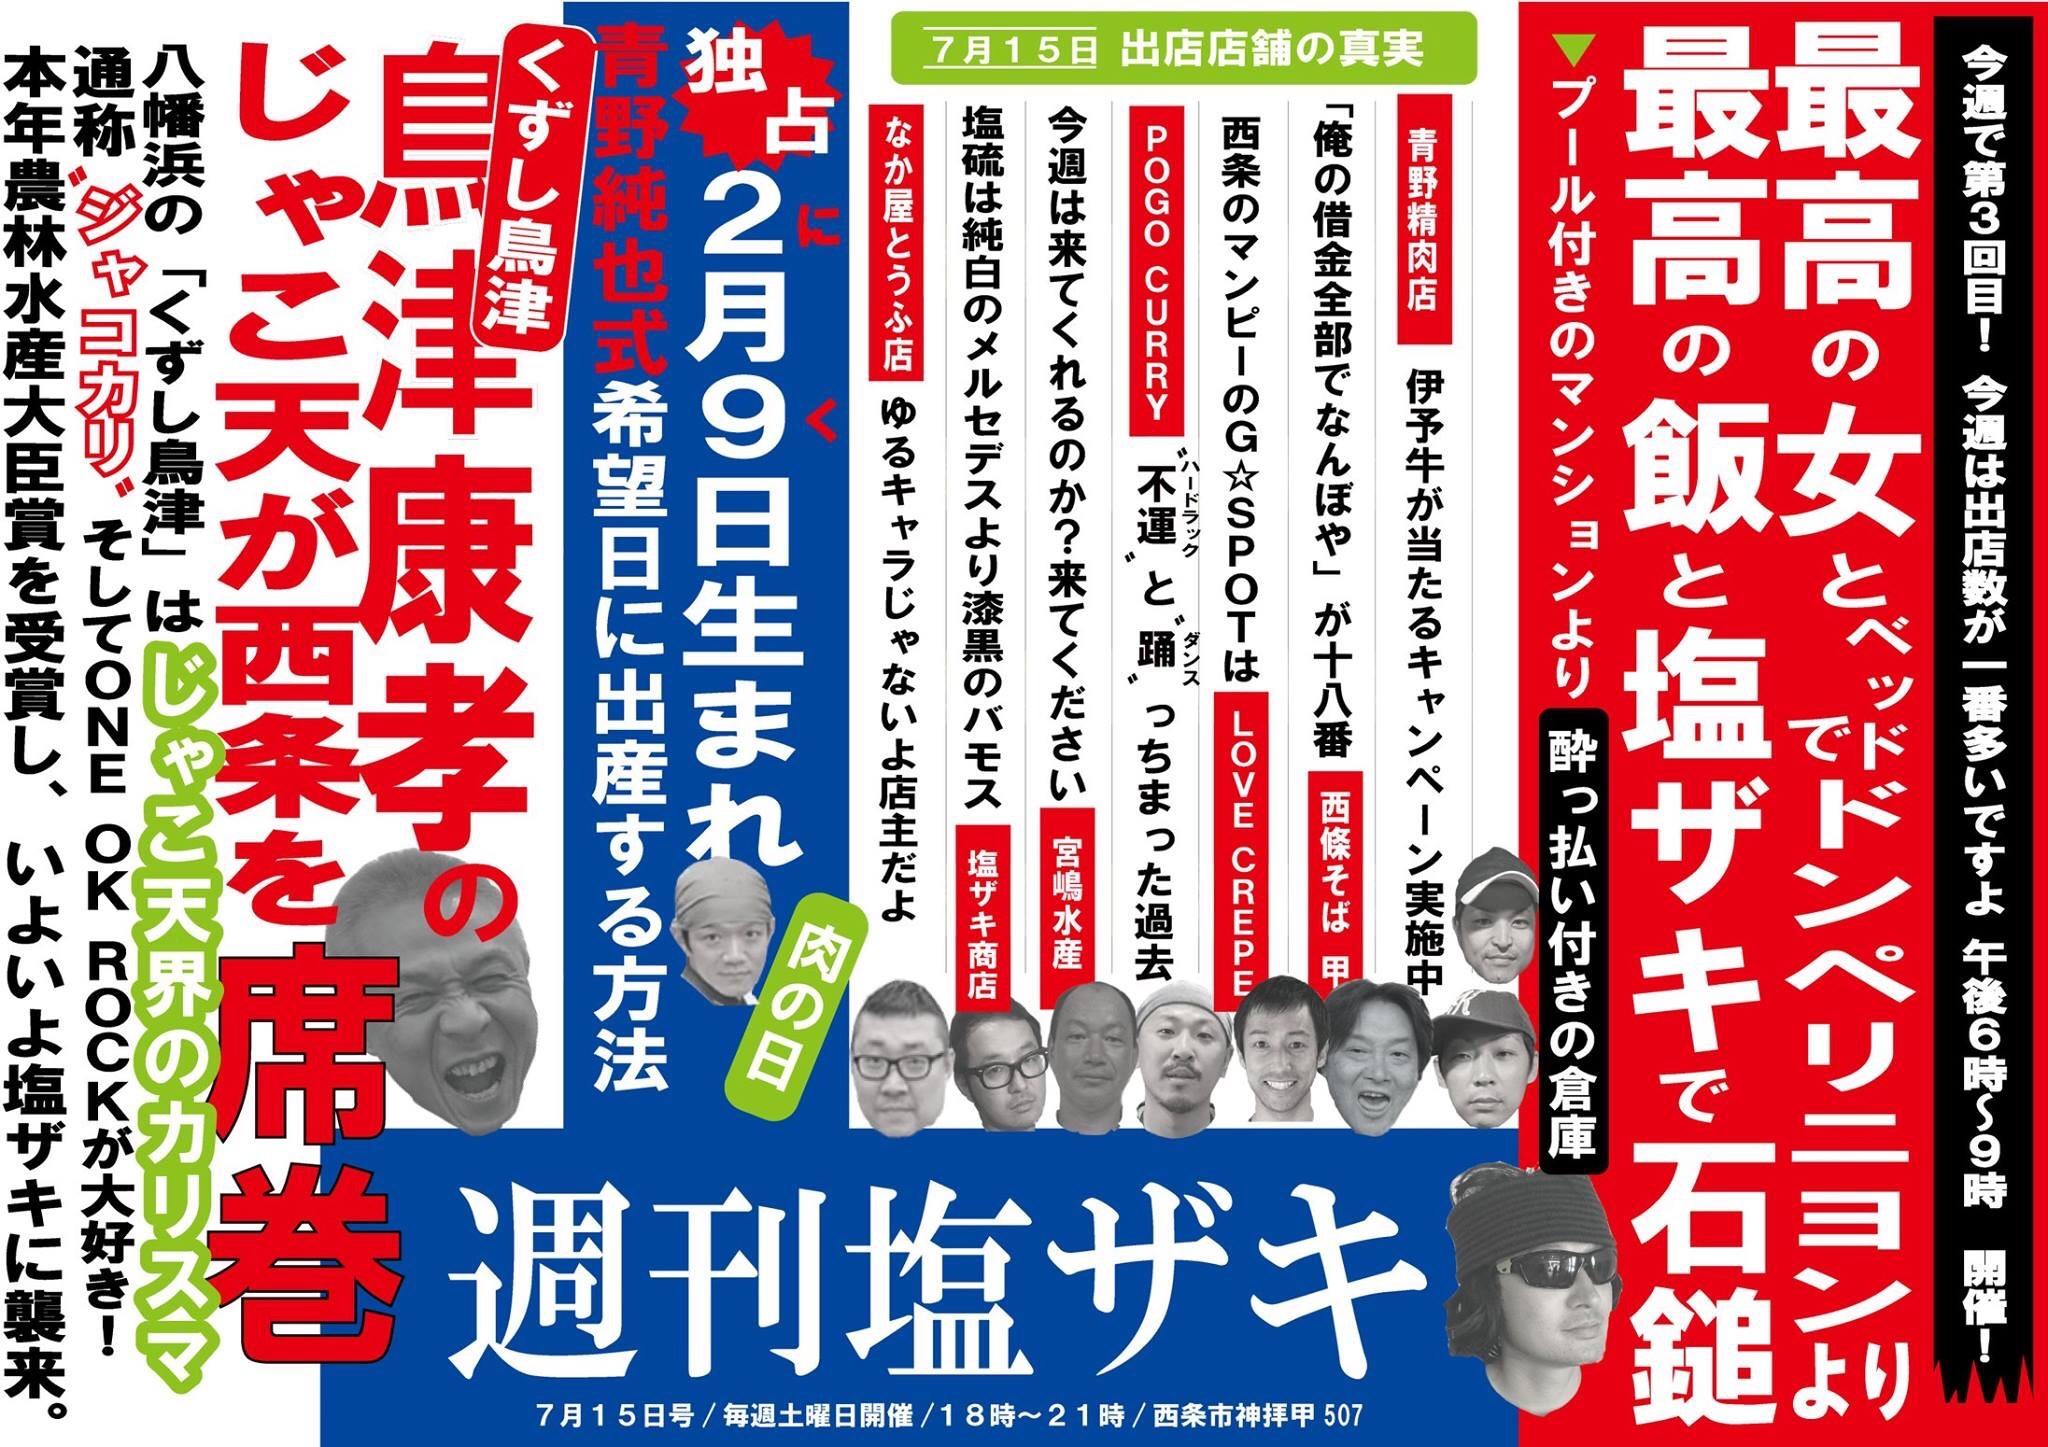 f:id:masanori-kato1972:20190323215453j:image